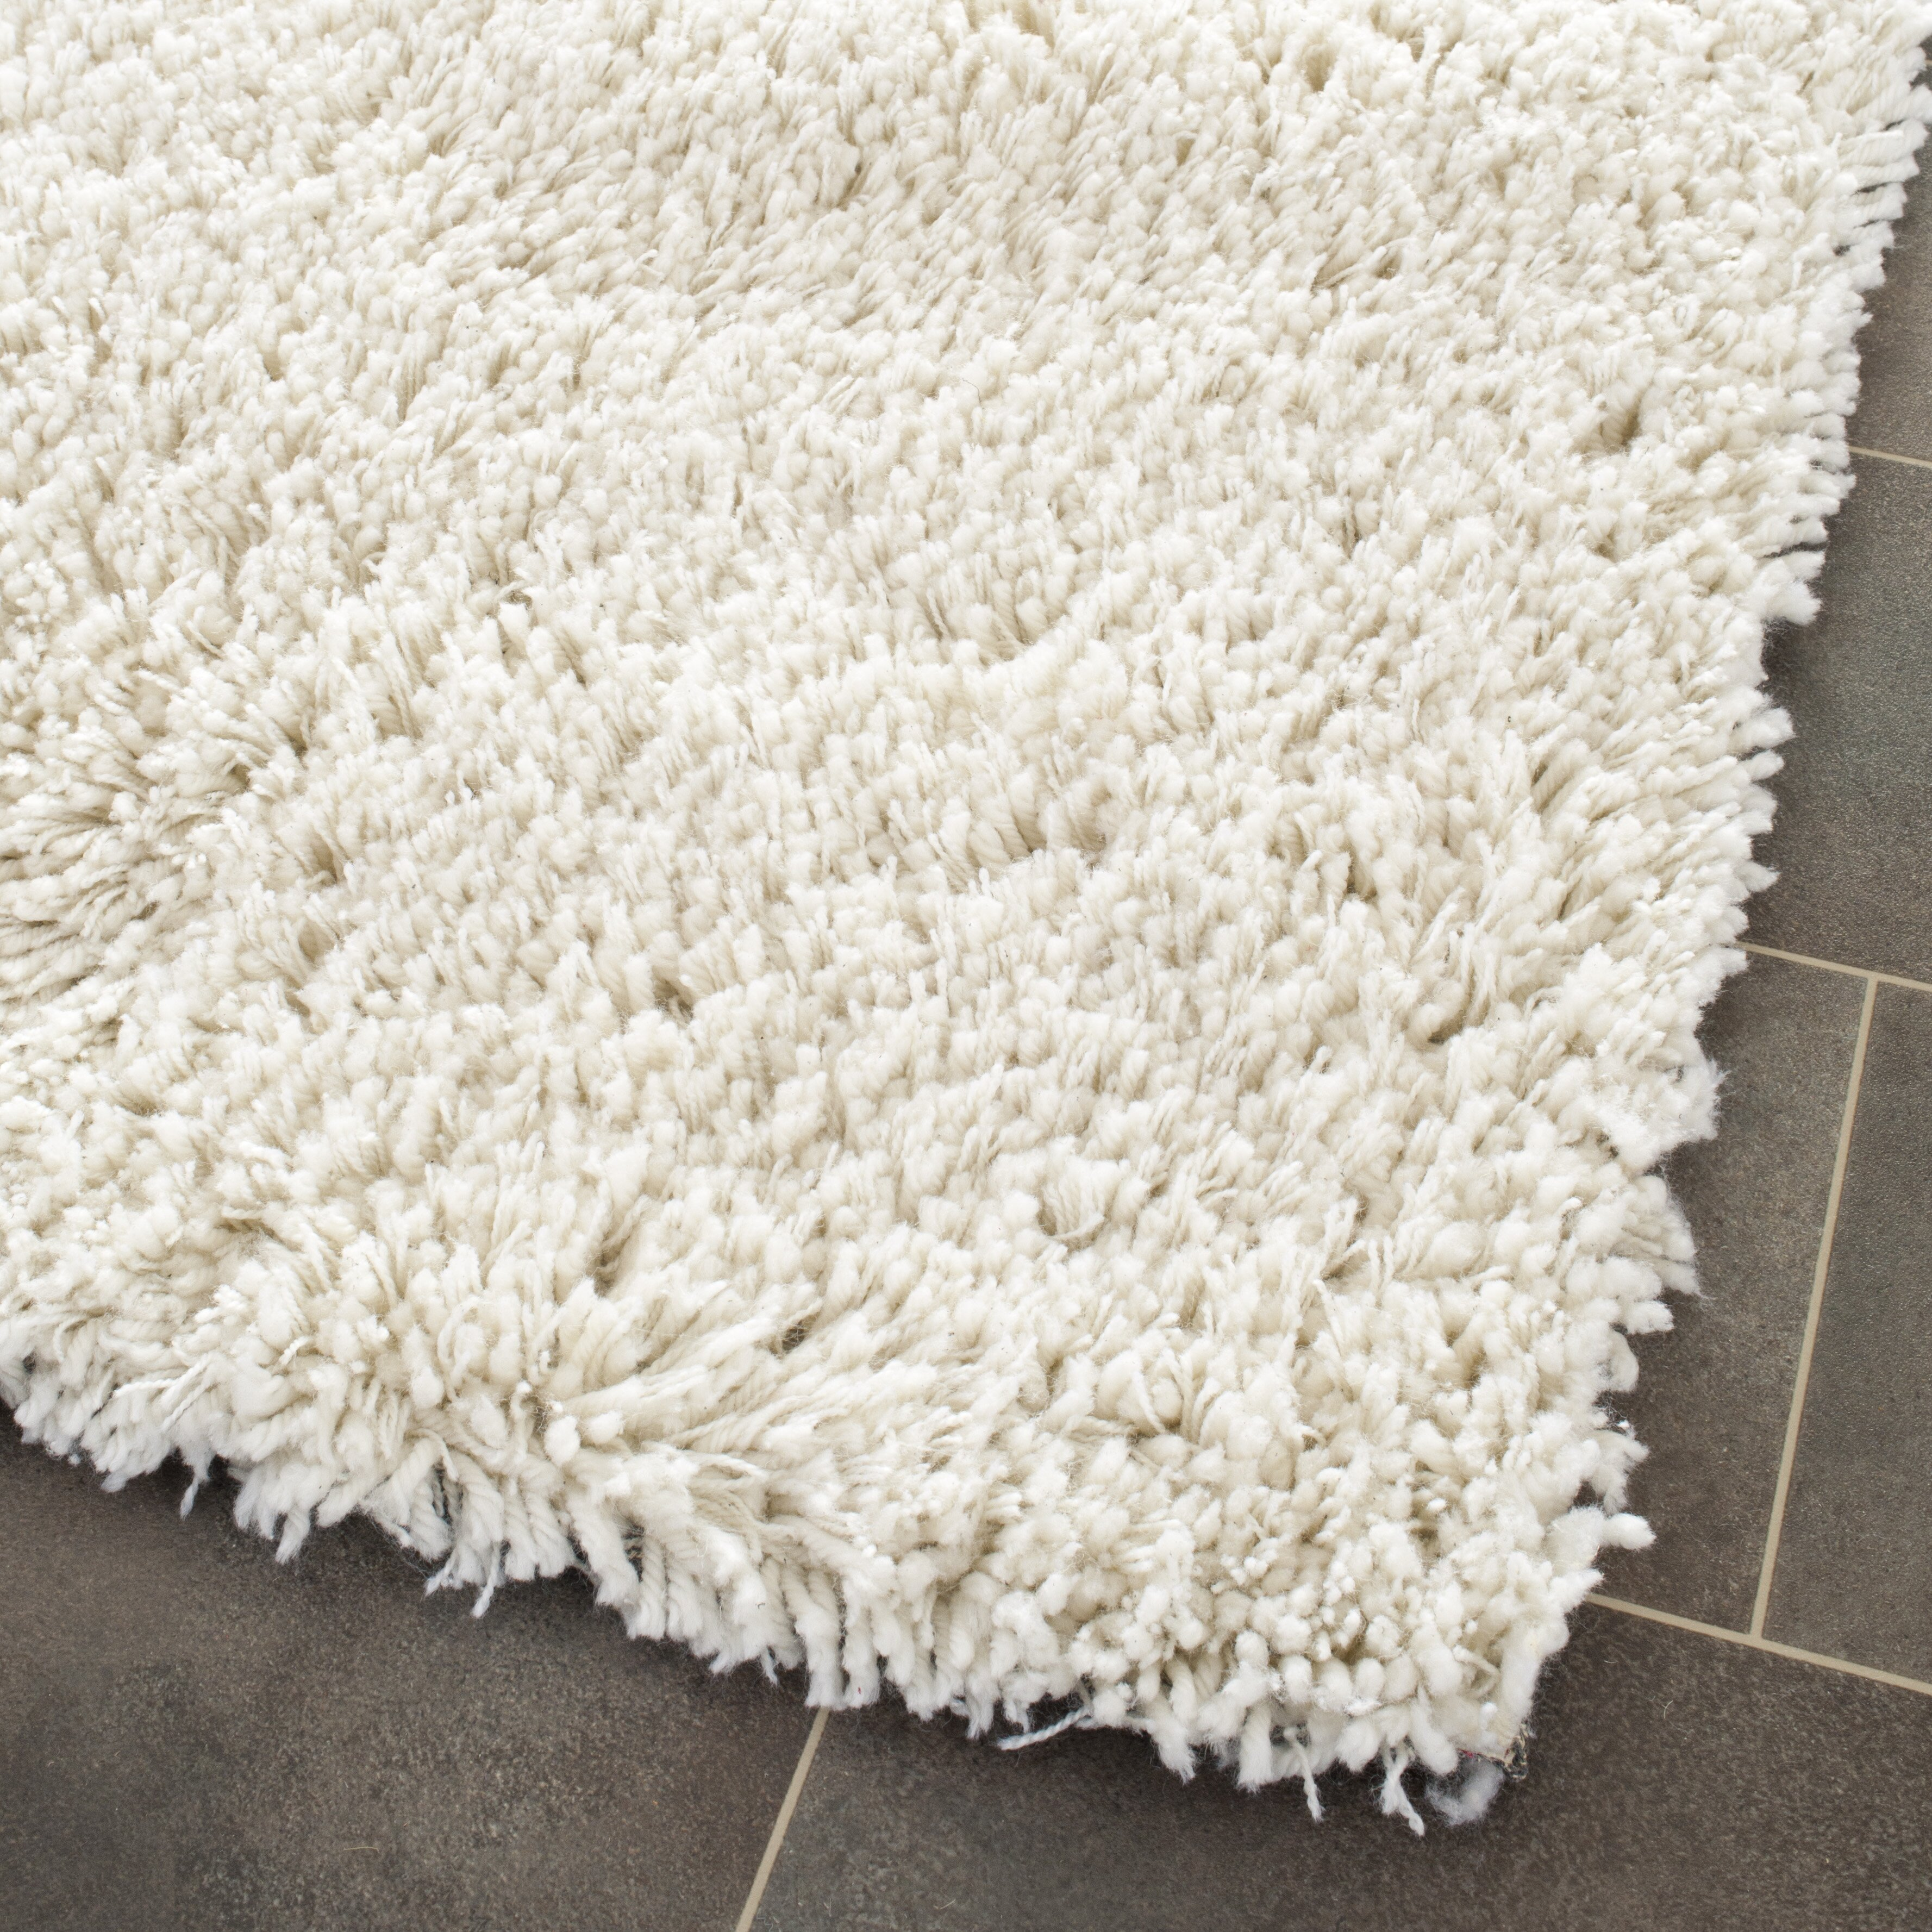 Charlton Home Pierce White Shag Area Rug u0026 Reviews : Wayfair